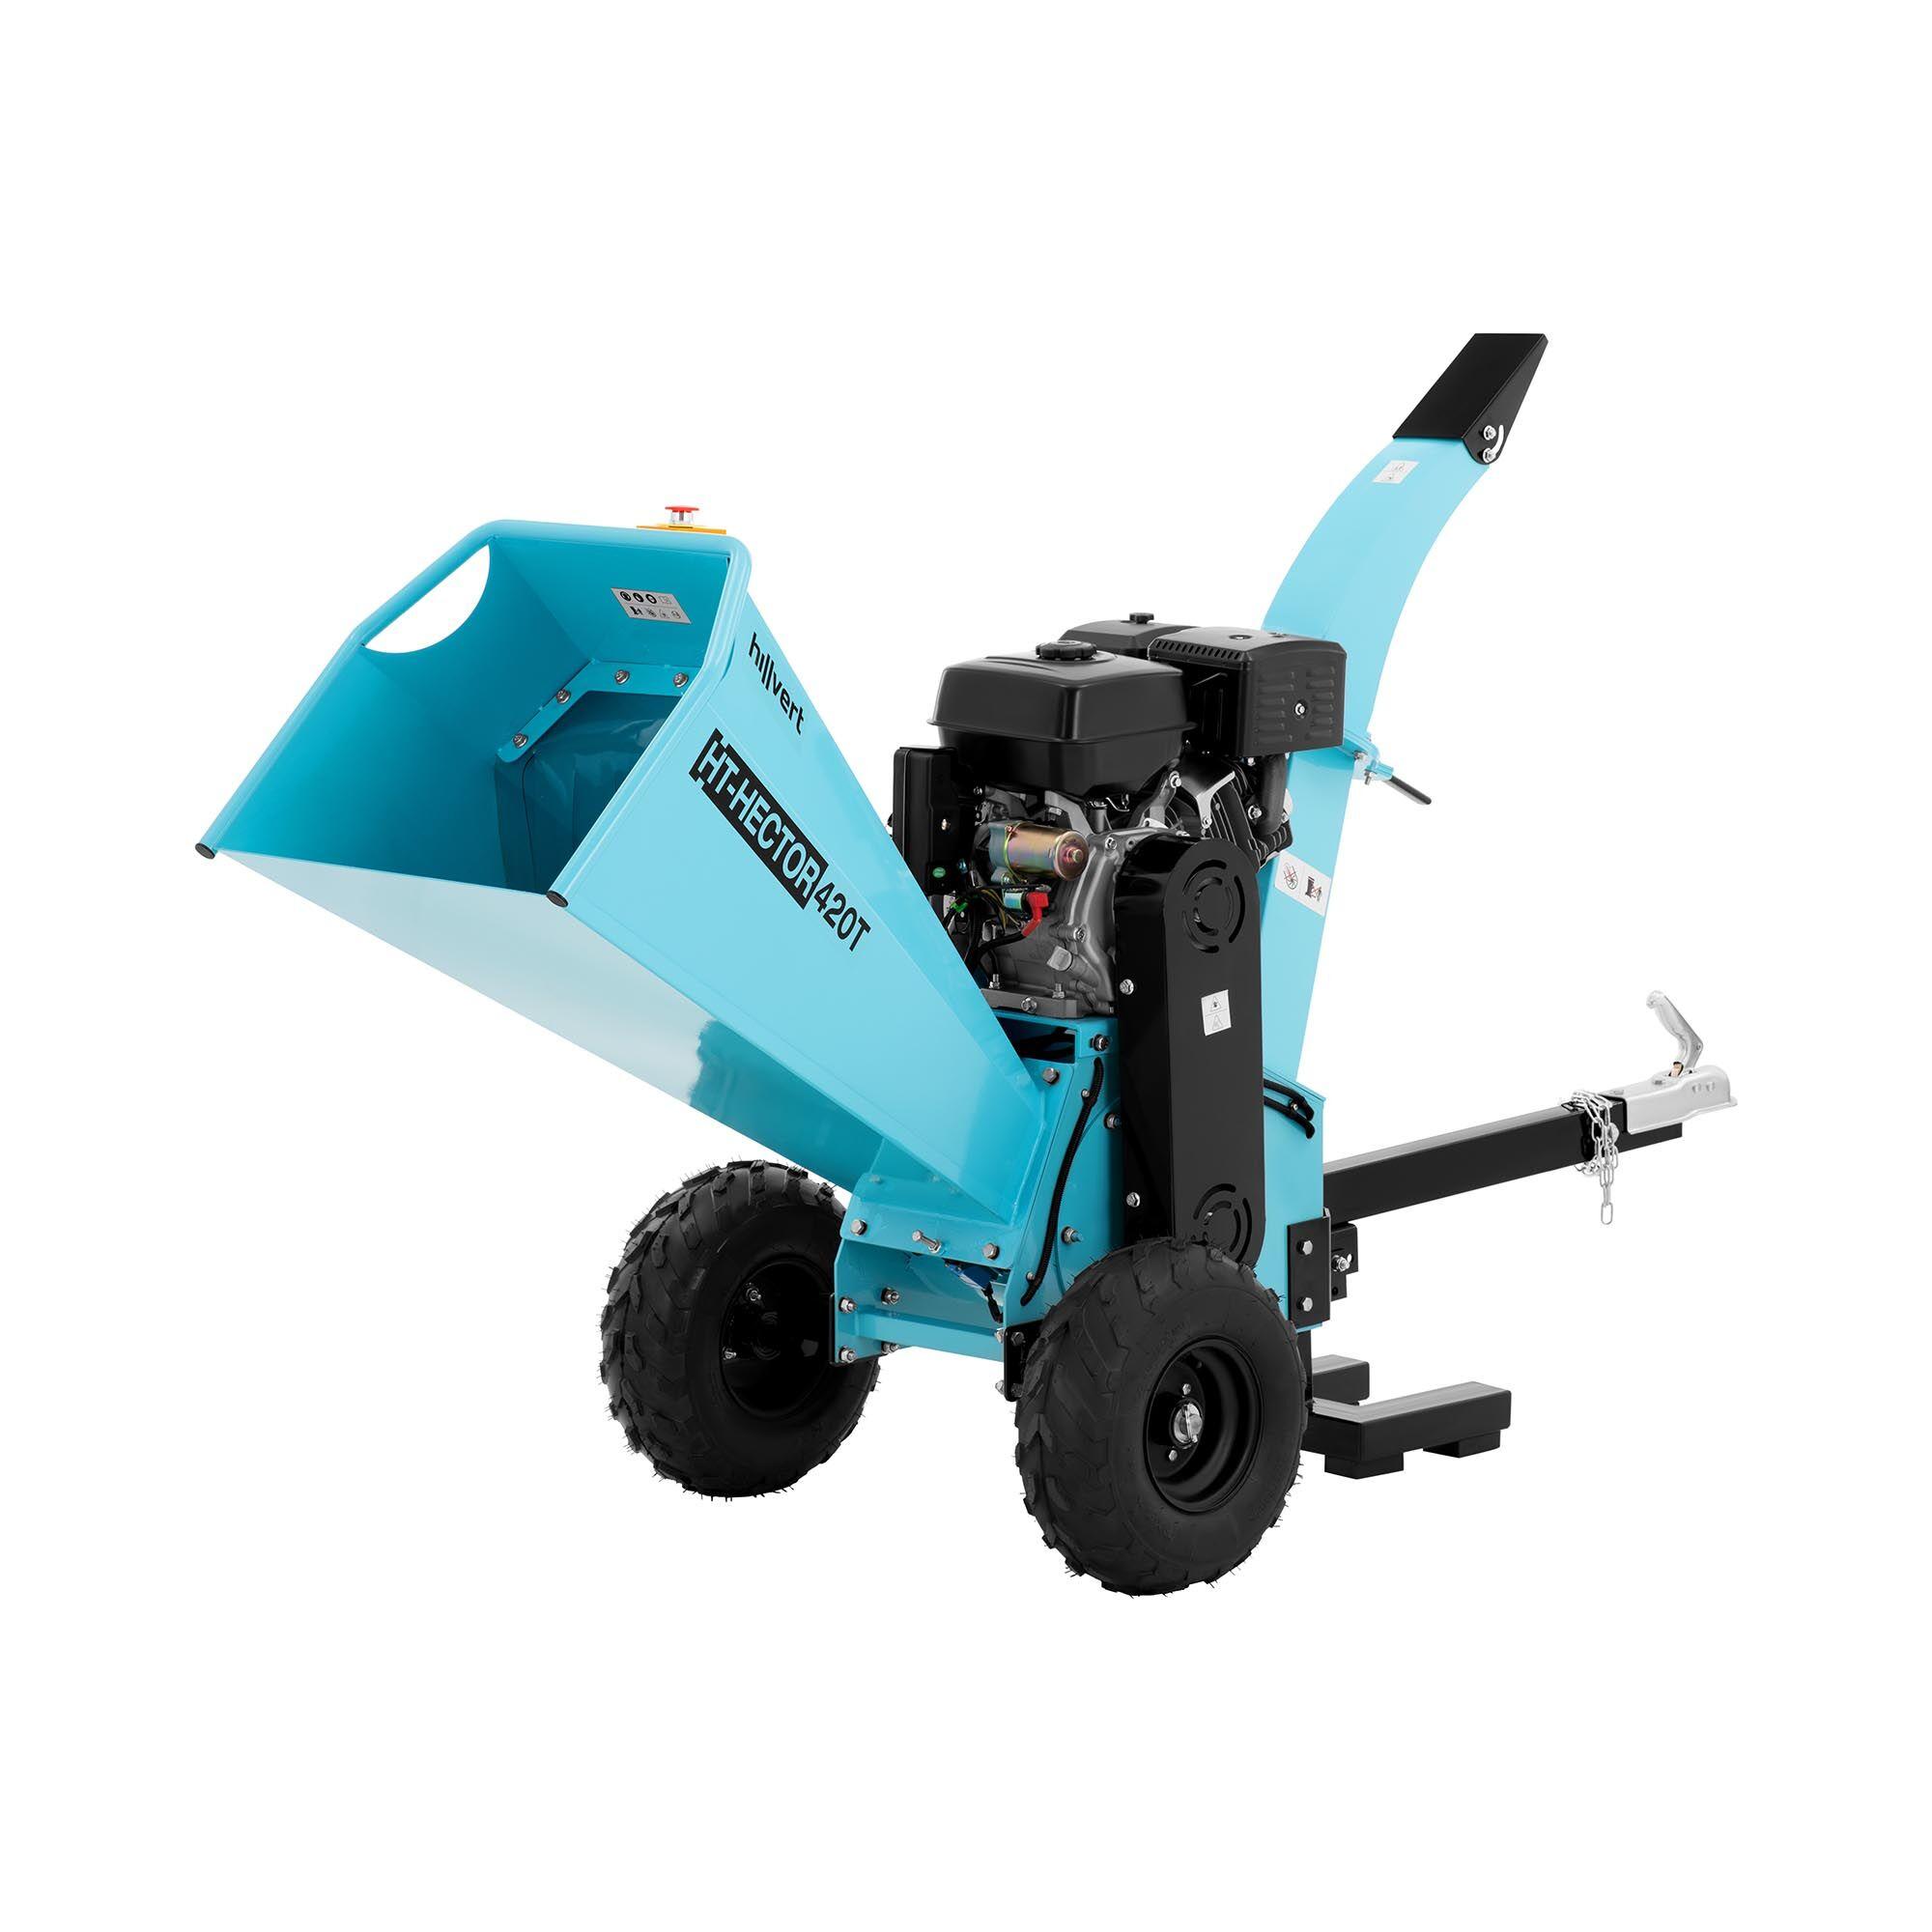 hillvert biotrituratore a scoppio - motore a benzina 15 cv - rami, foglie e legno fino a 120 mm ht-hector 420t